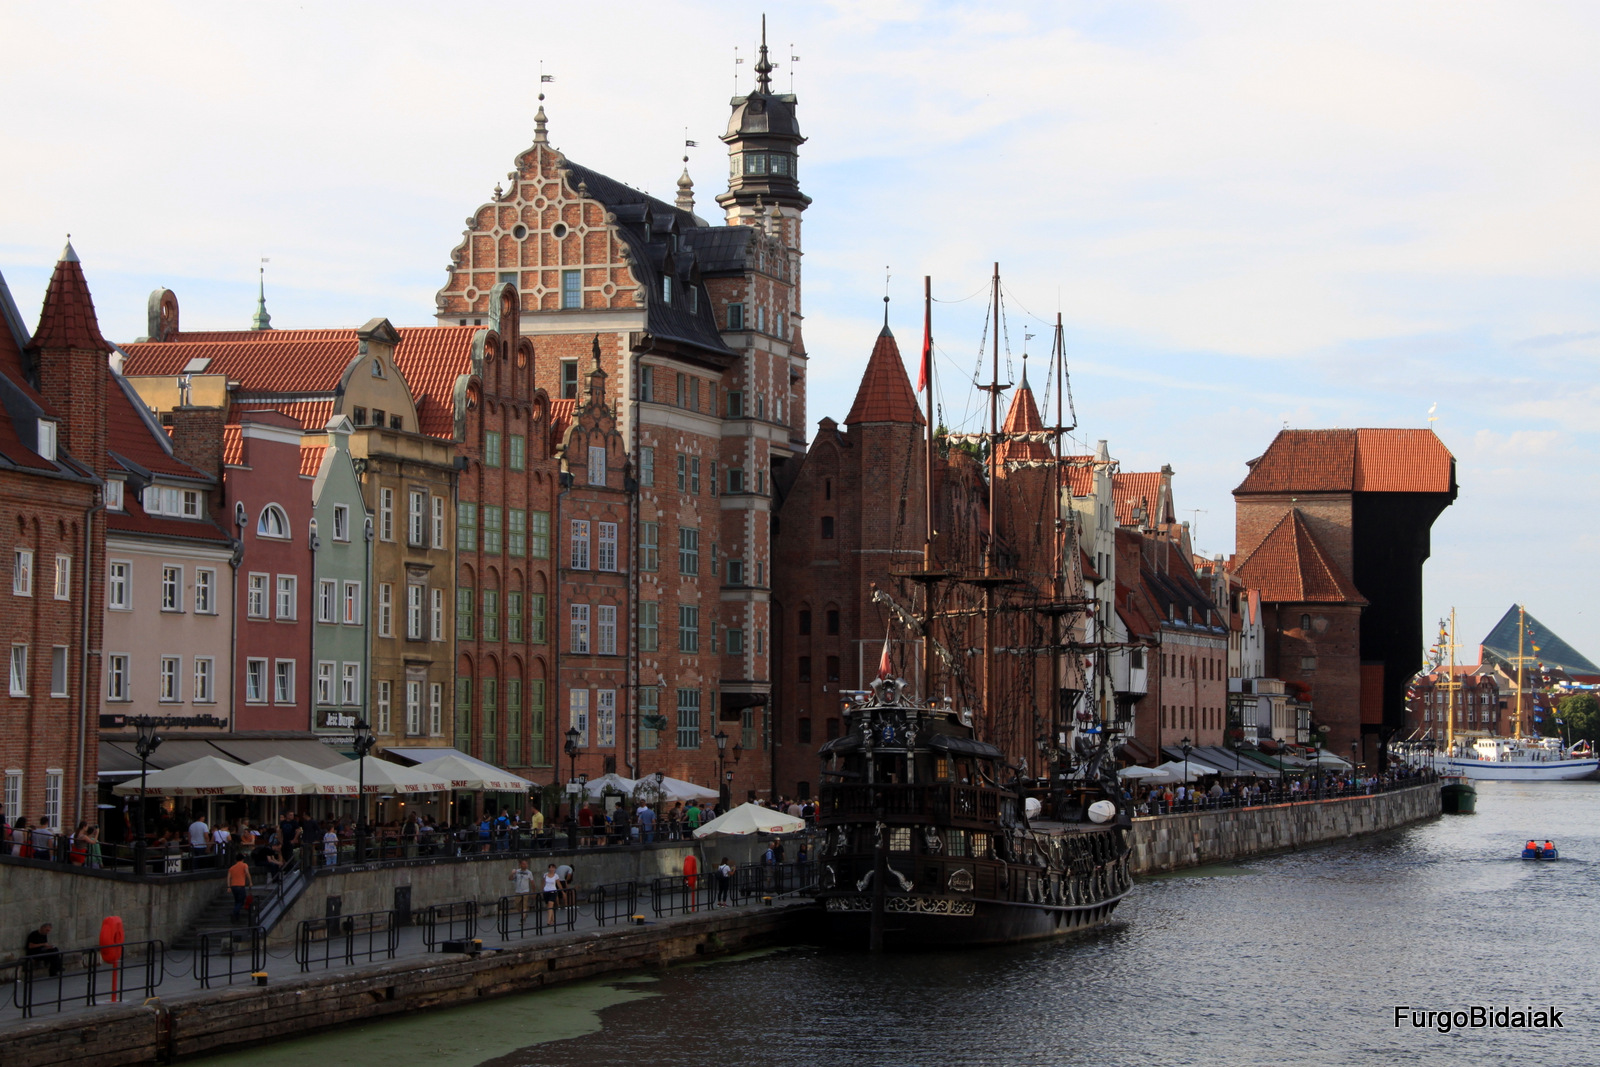 Muelles de Gdansk, Zuraw, Polonia, Ruta Báltica